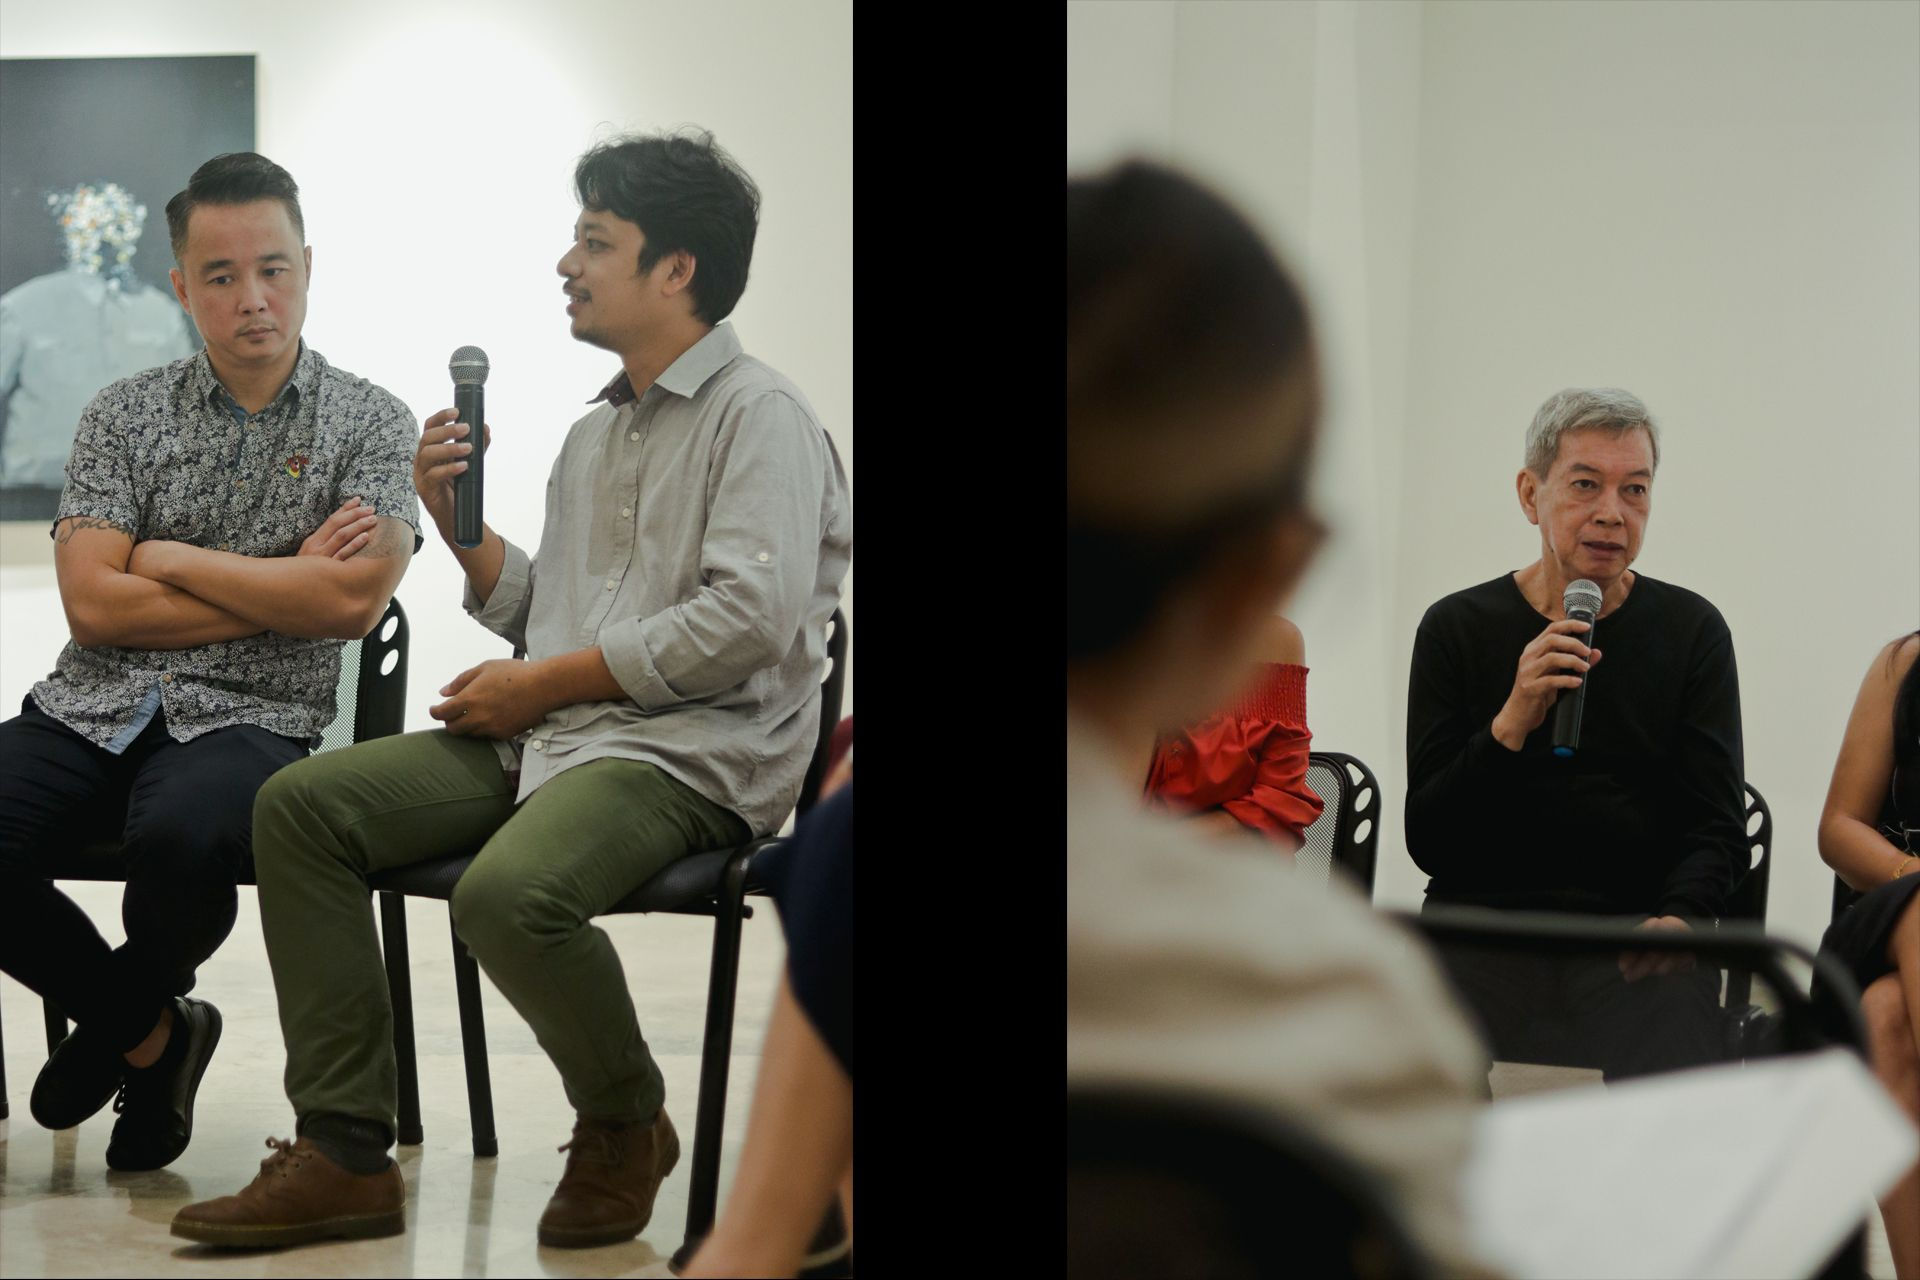 L: Chris Chong Chan Fui (Malaysia) & Min Thein Sung (Myanmar); R: Roberto Feleo (Philippines)